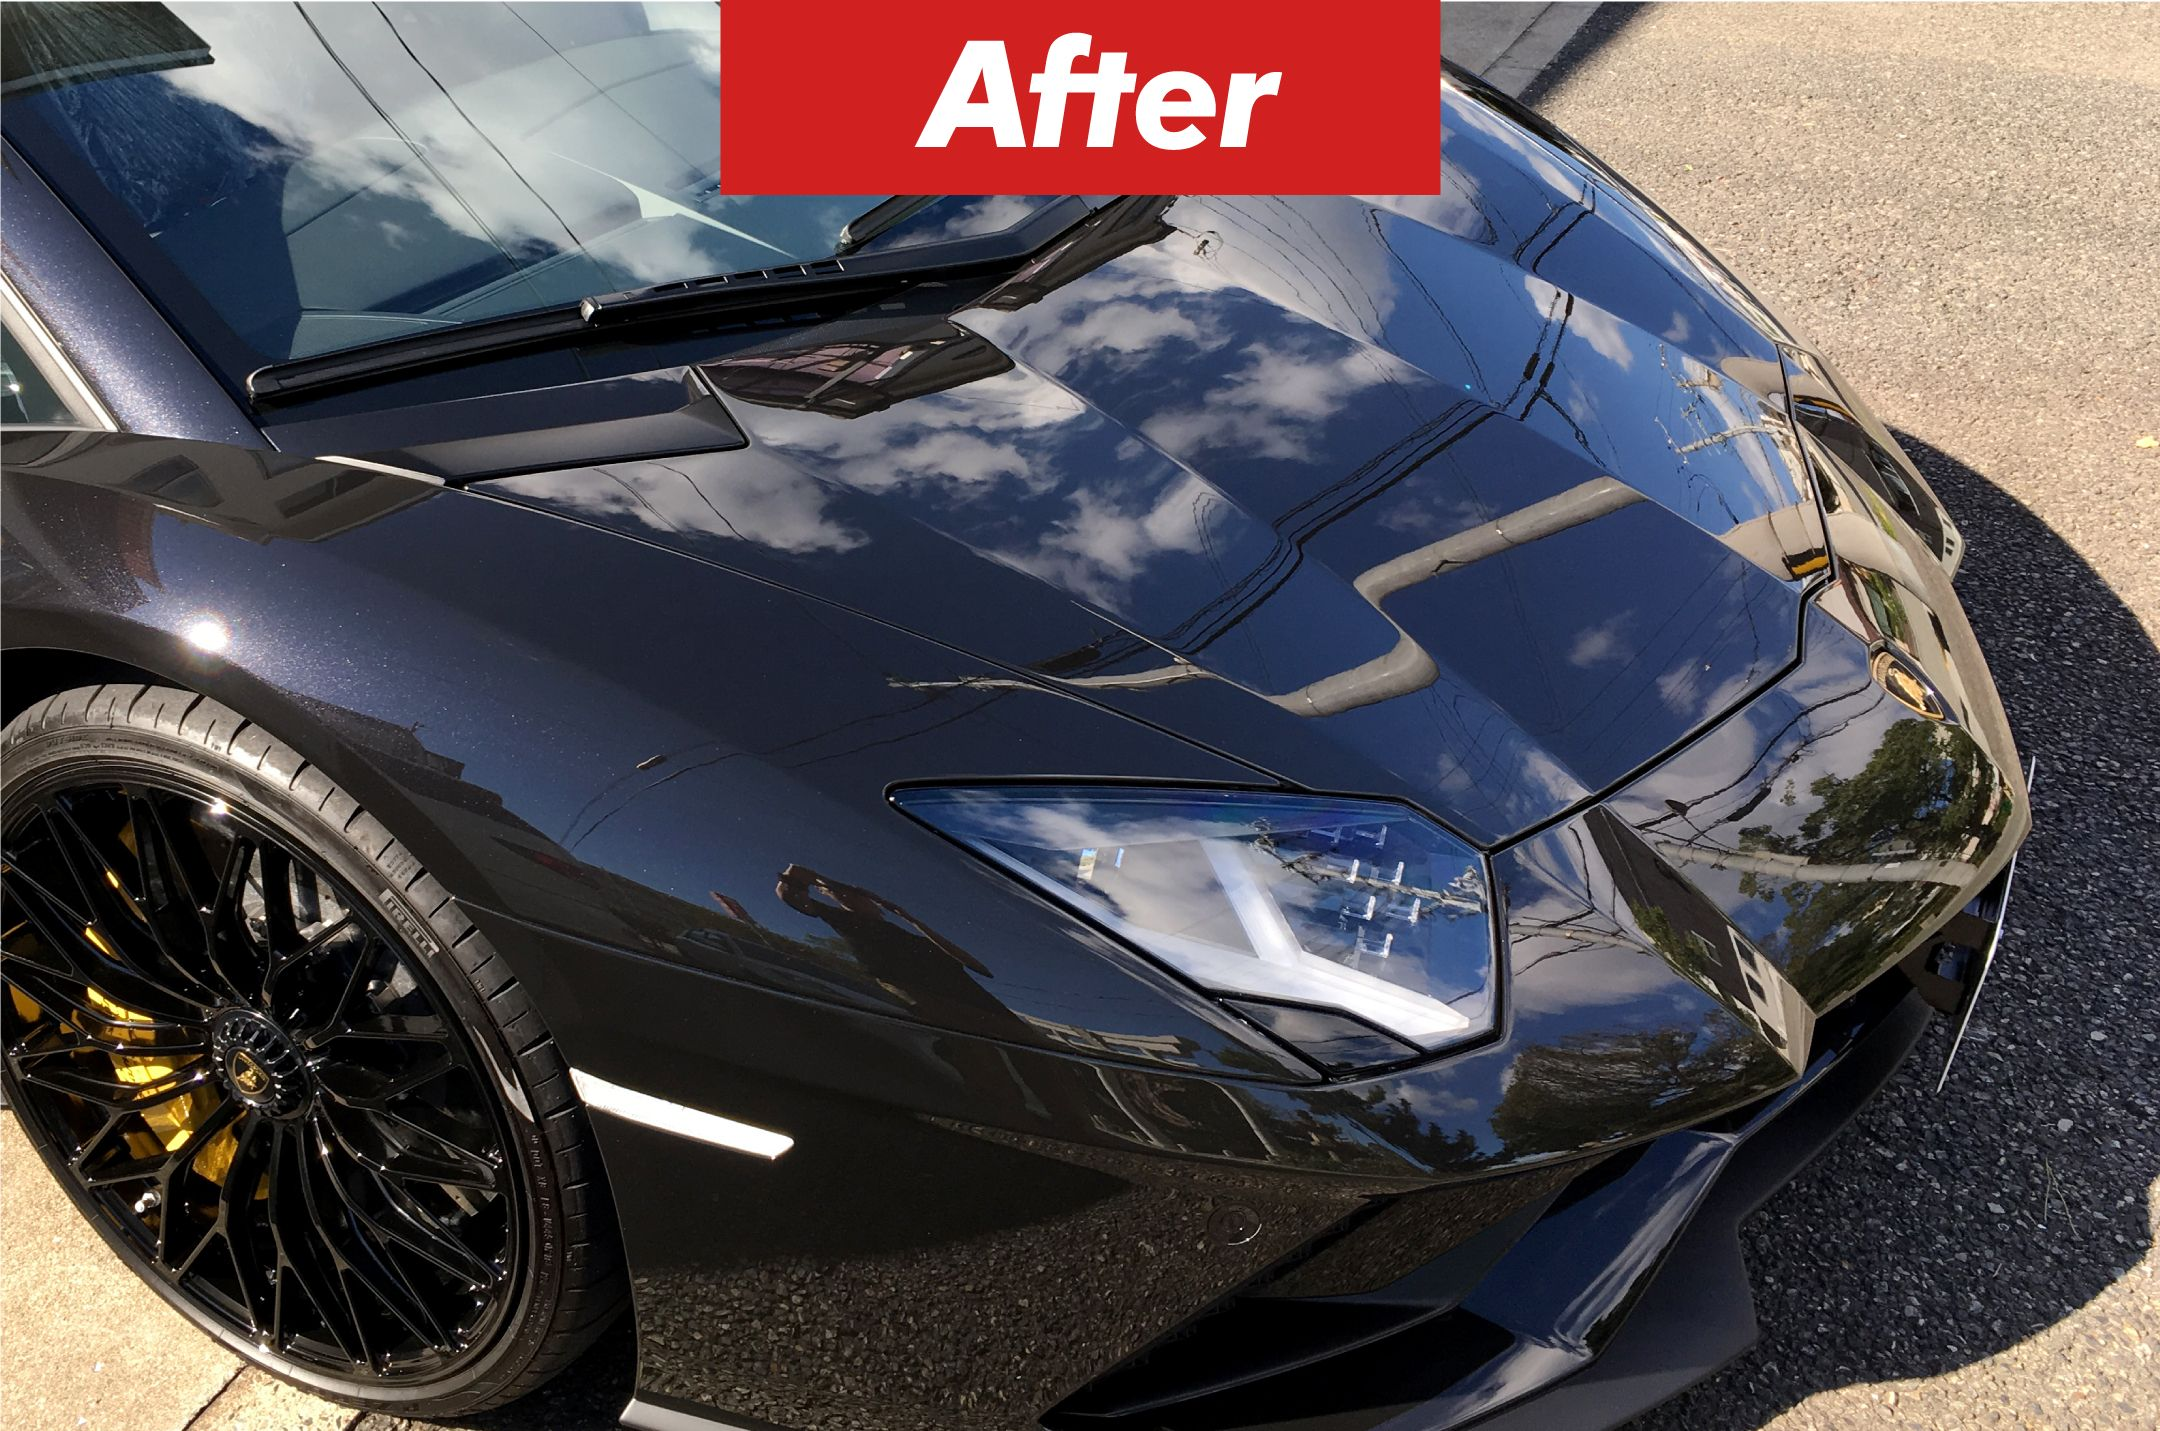 Exterior Accessories Automobiles & Motorcycles Car Styling Auto Body Decoration Line Stickers For Lamborghini Aventador Centenario Huracan Murcielago Reventon Car Accessories